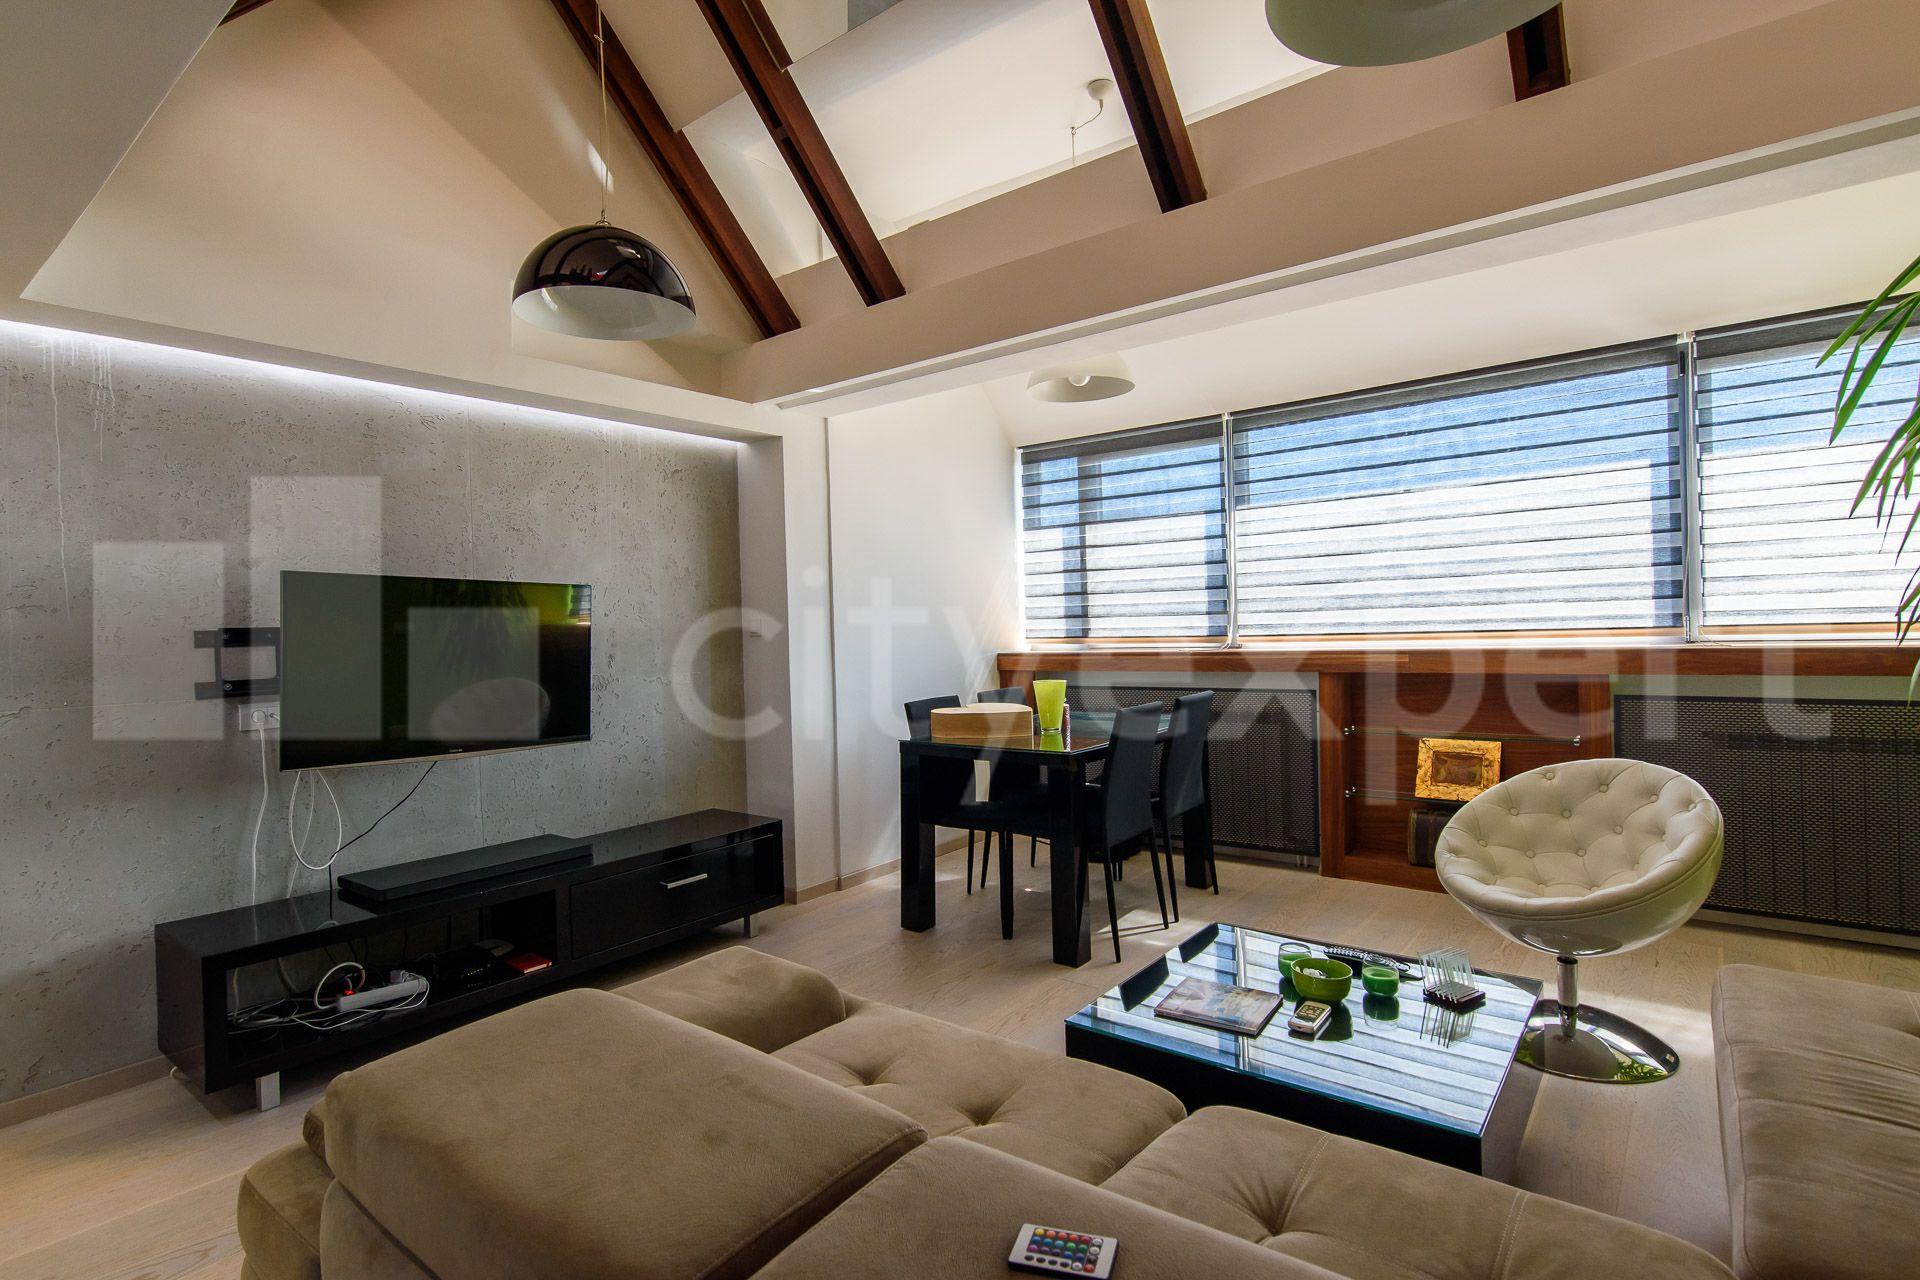 Sale Apartment Dragice Koncar Vozdovac Id 18250 Cityexpert